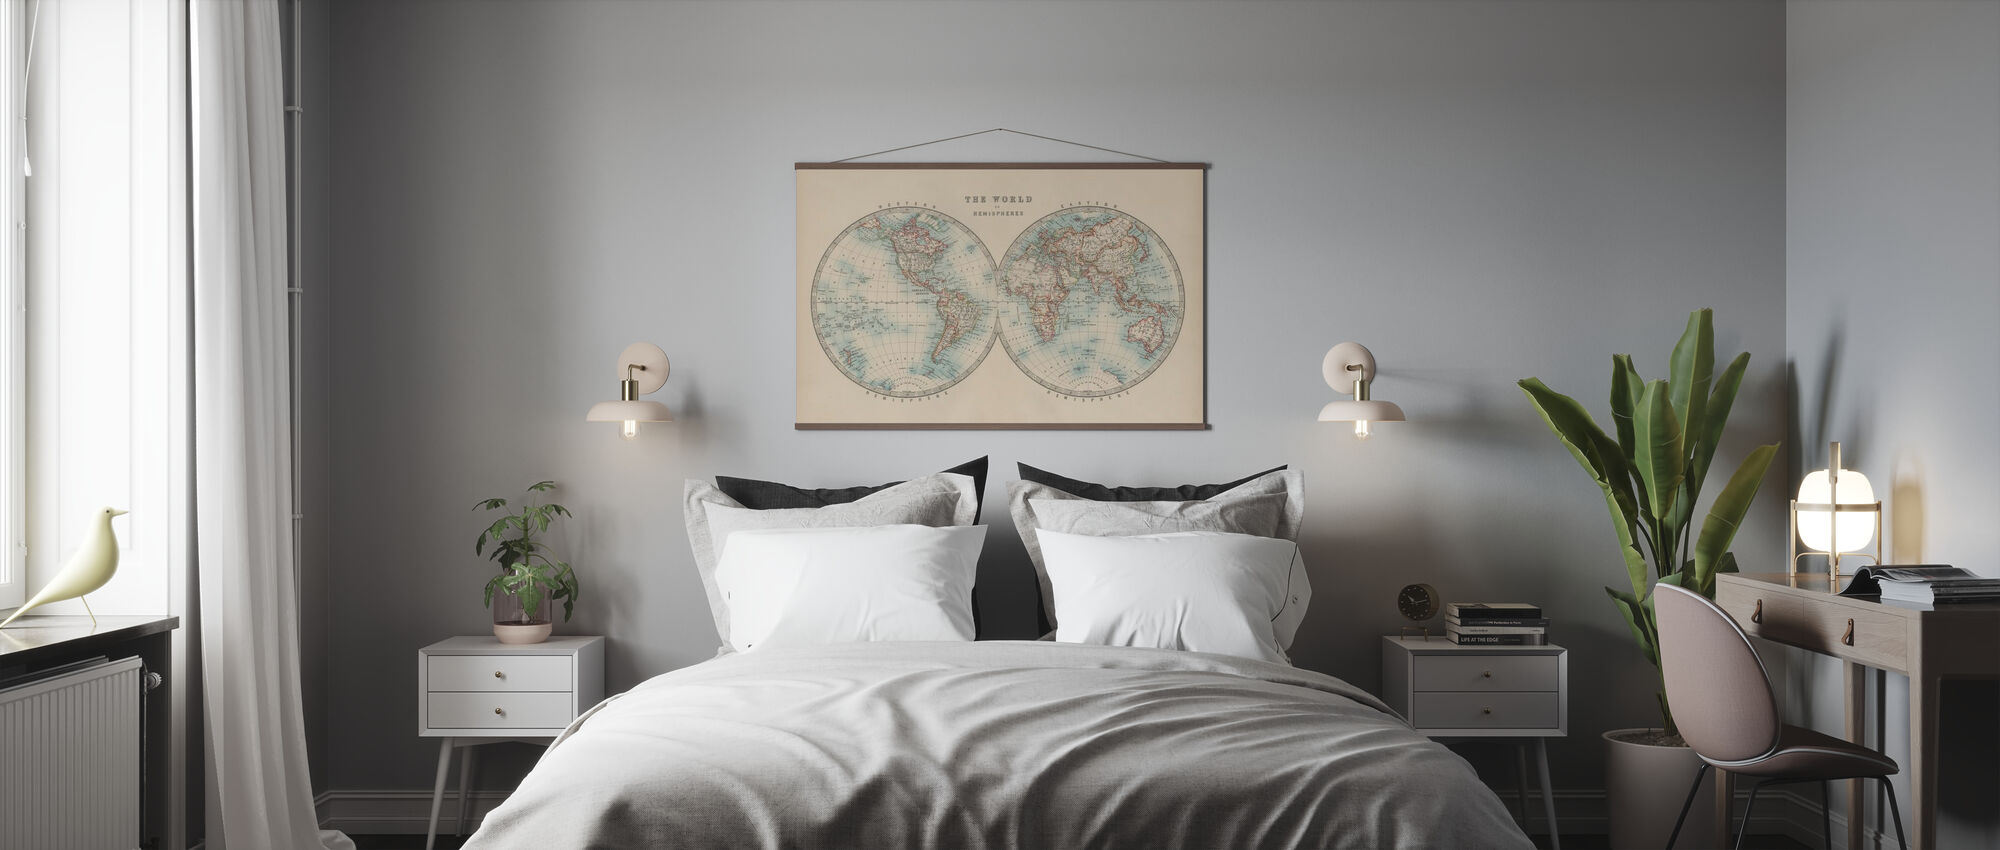 Johnstons Wereld in Hemisferen - Poster - Slaapkamer